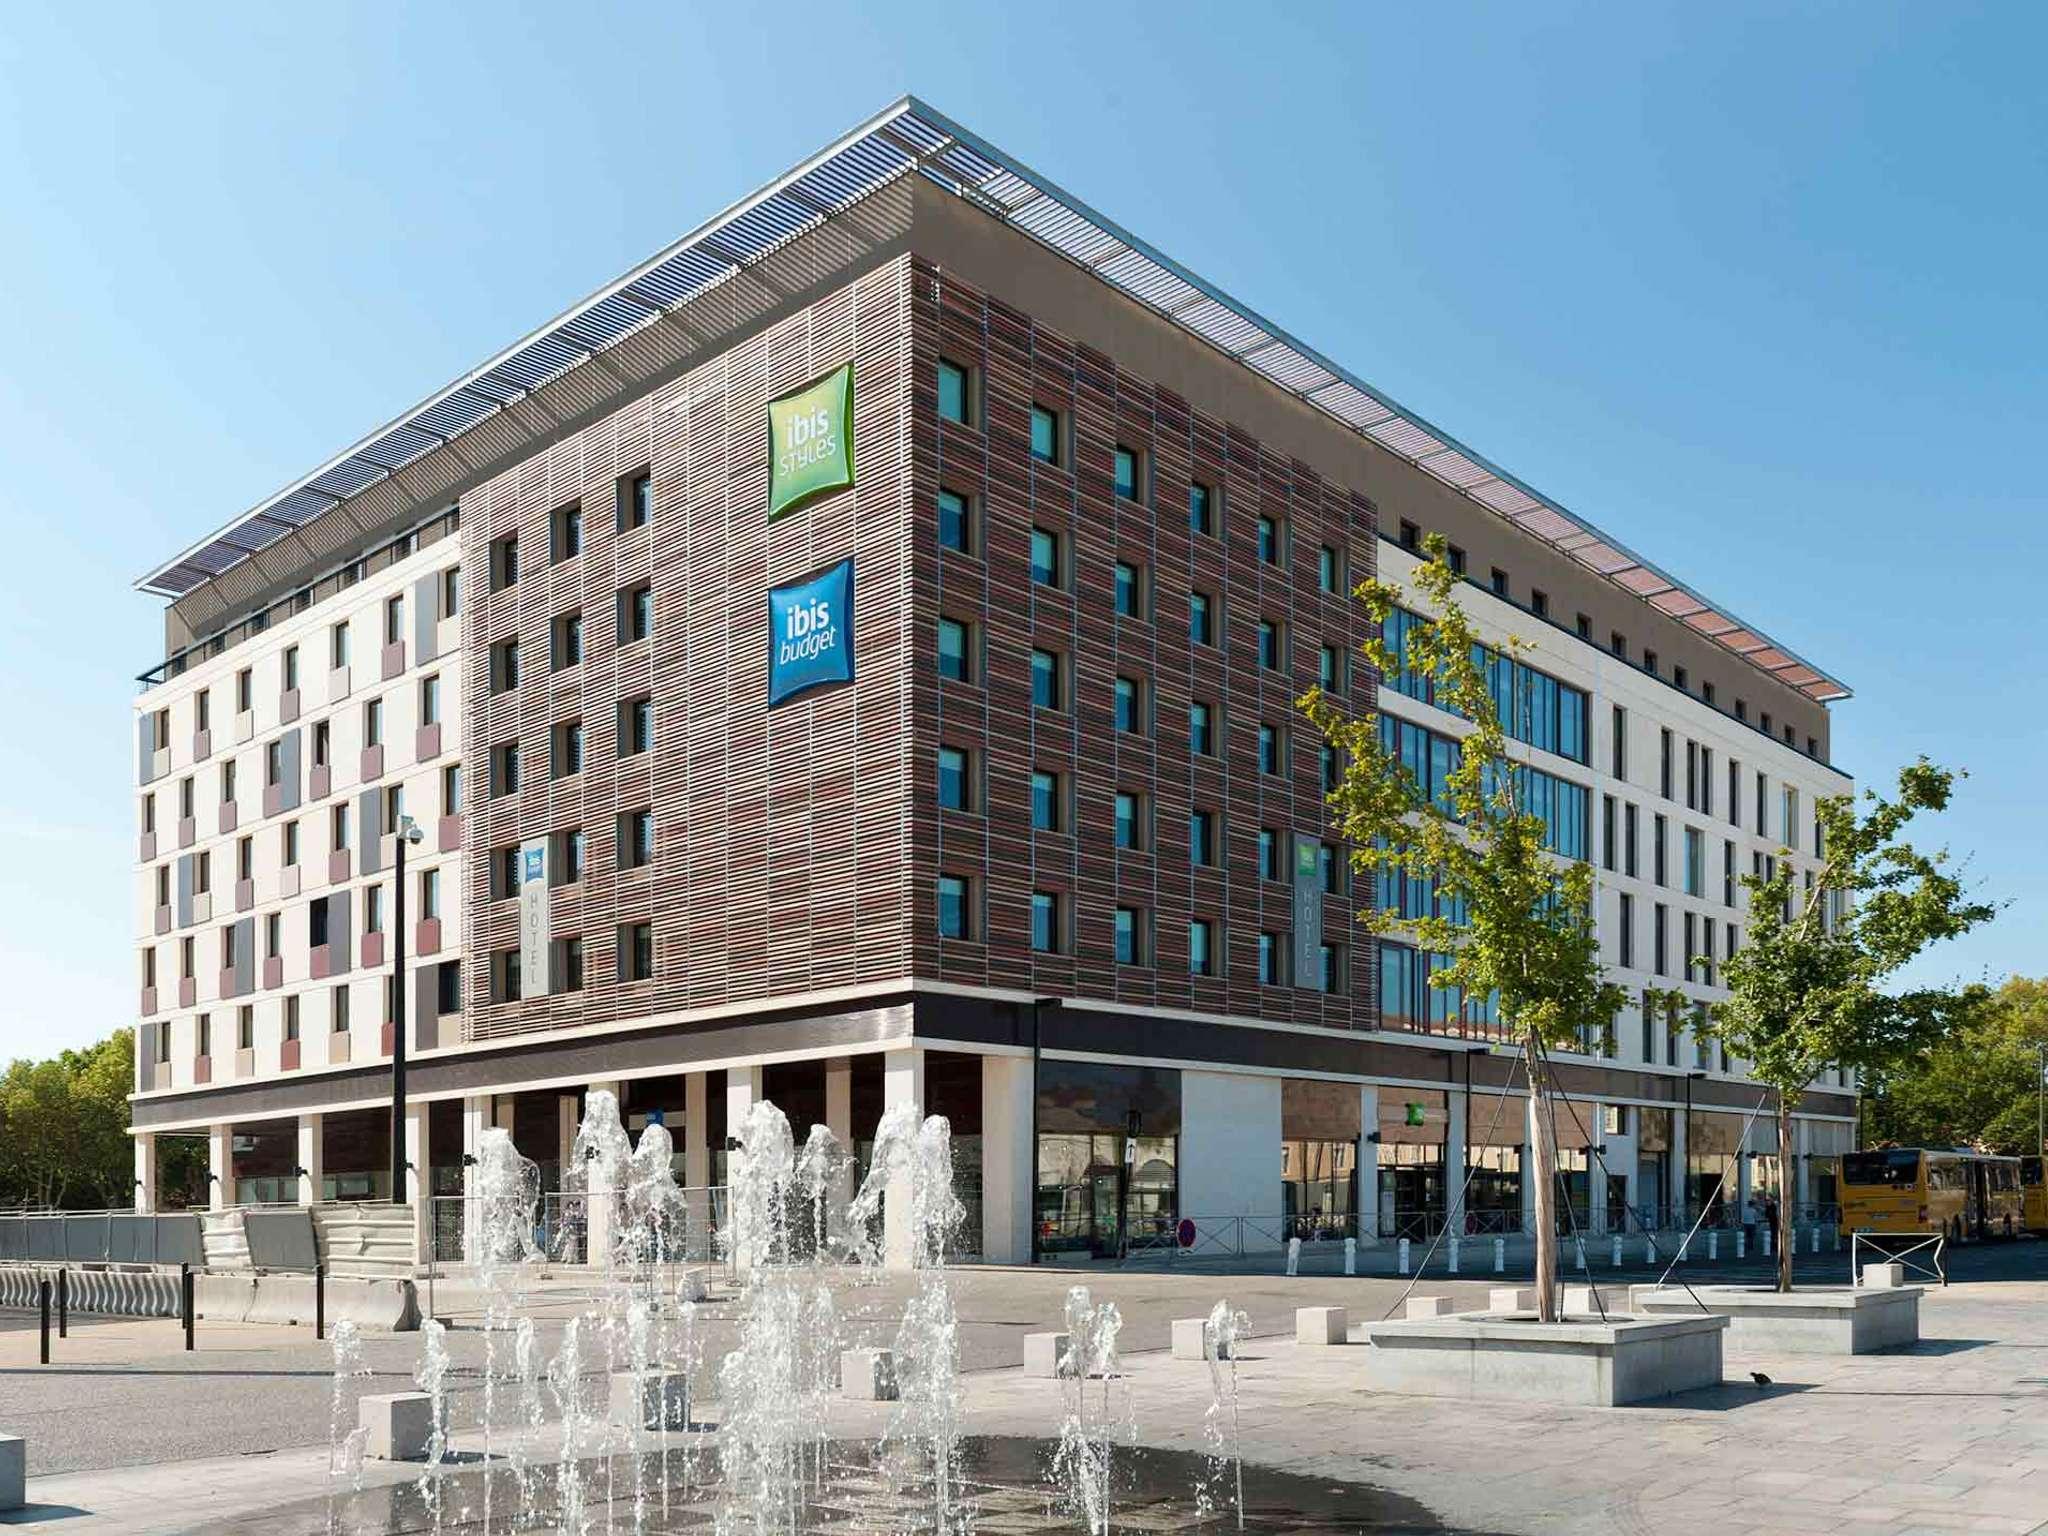 Hotel In Nimes